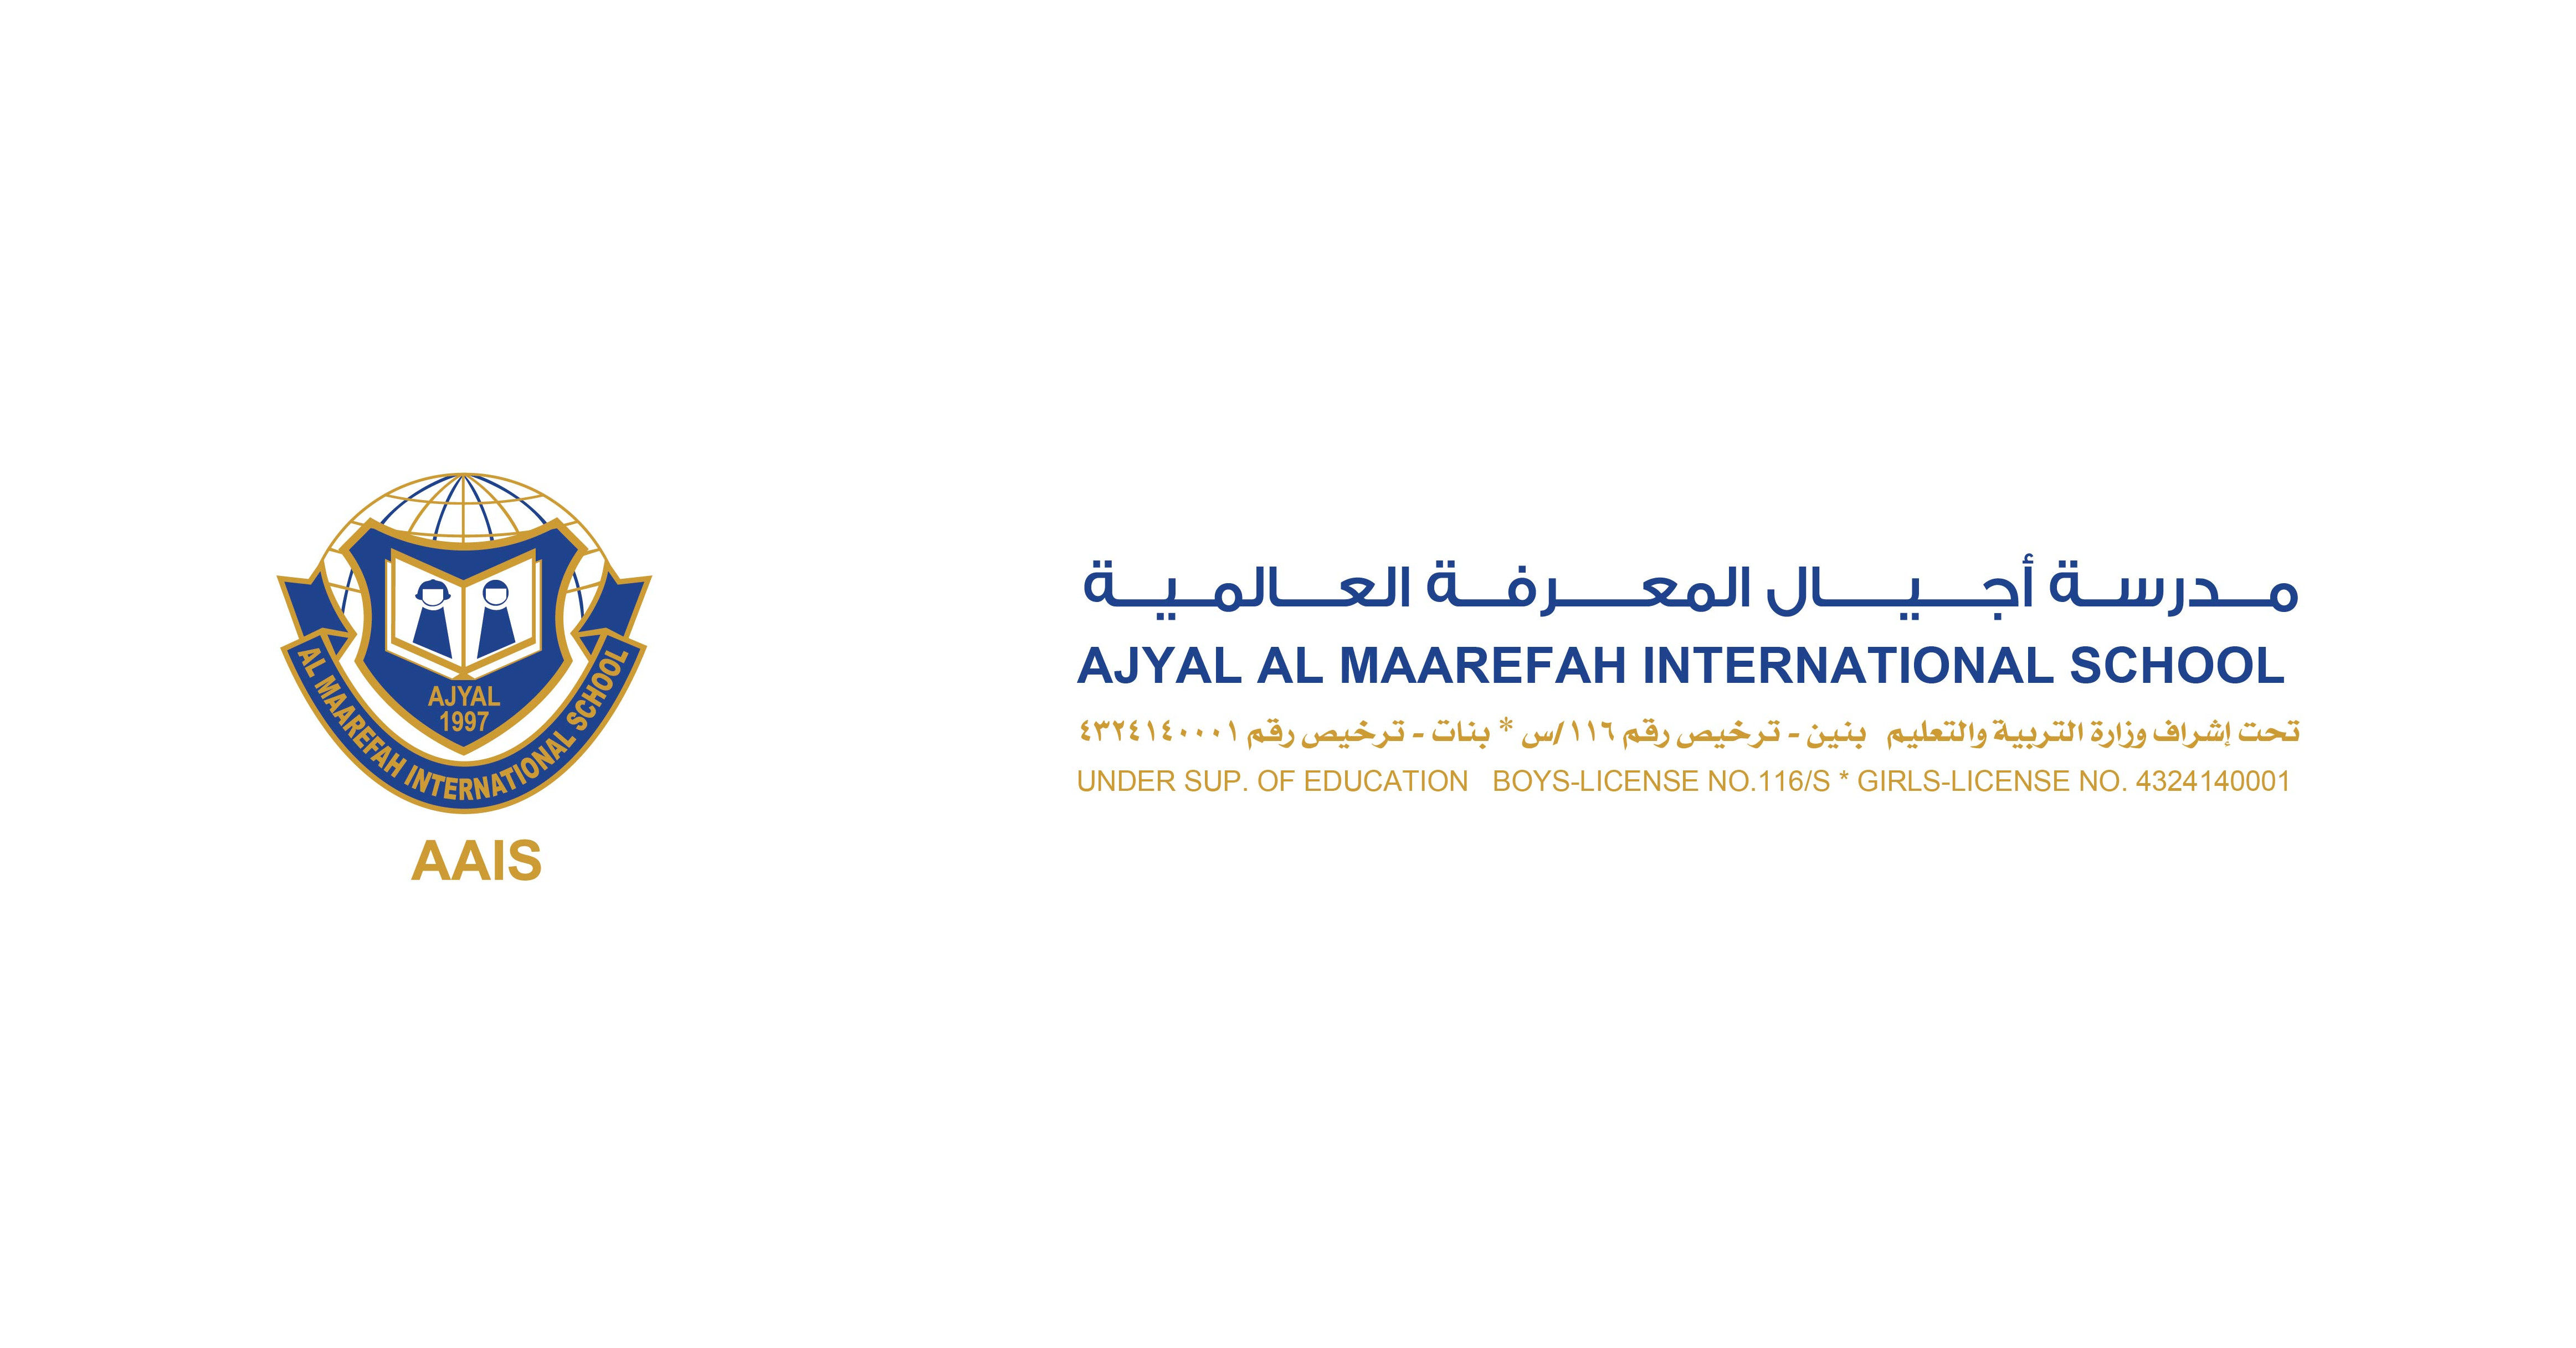 Job: Student Account Services Specialist at Ajyal Al